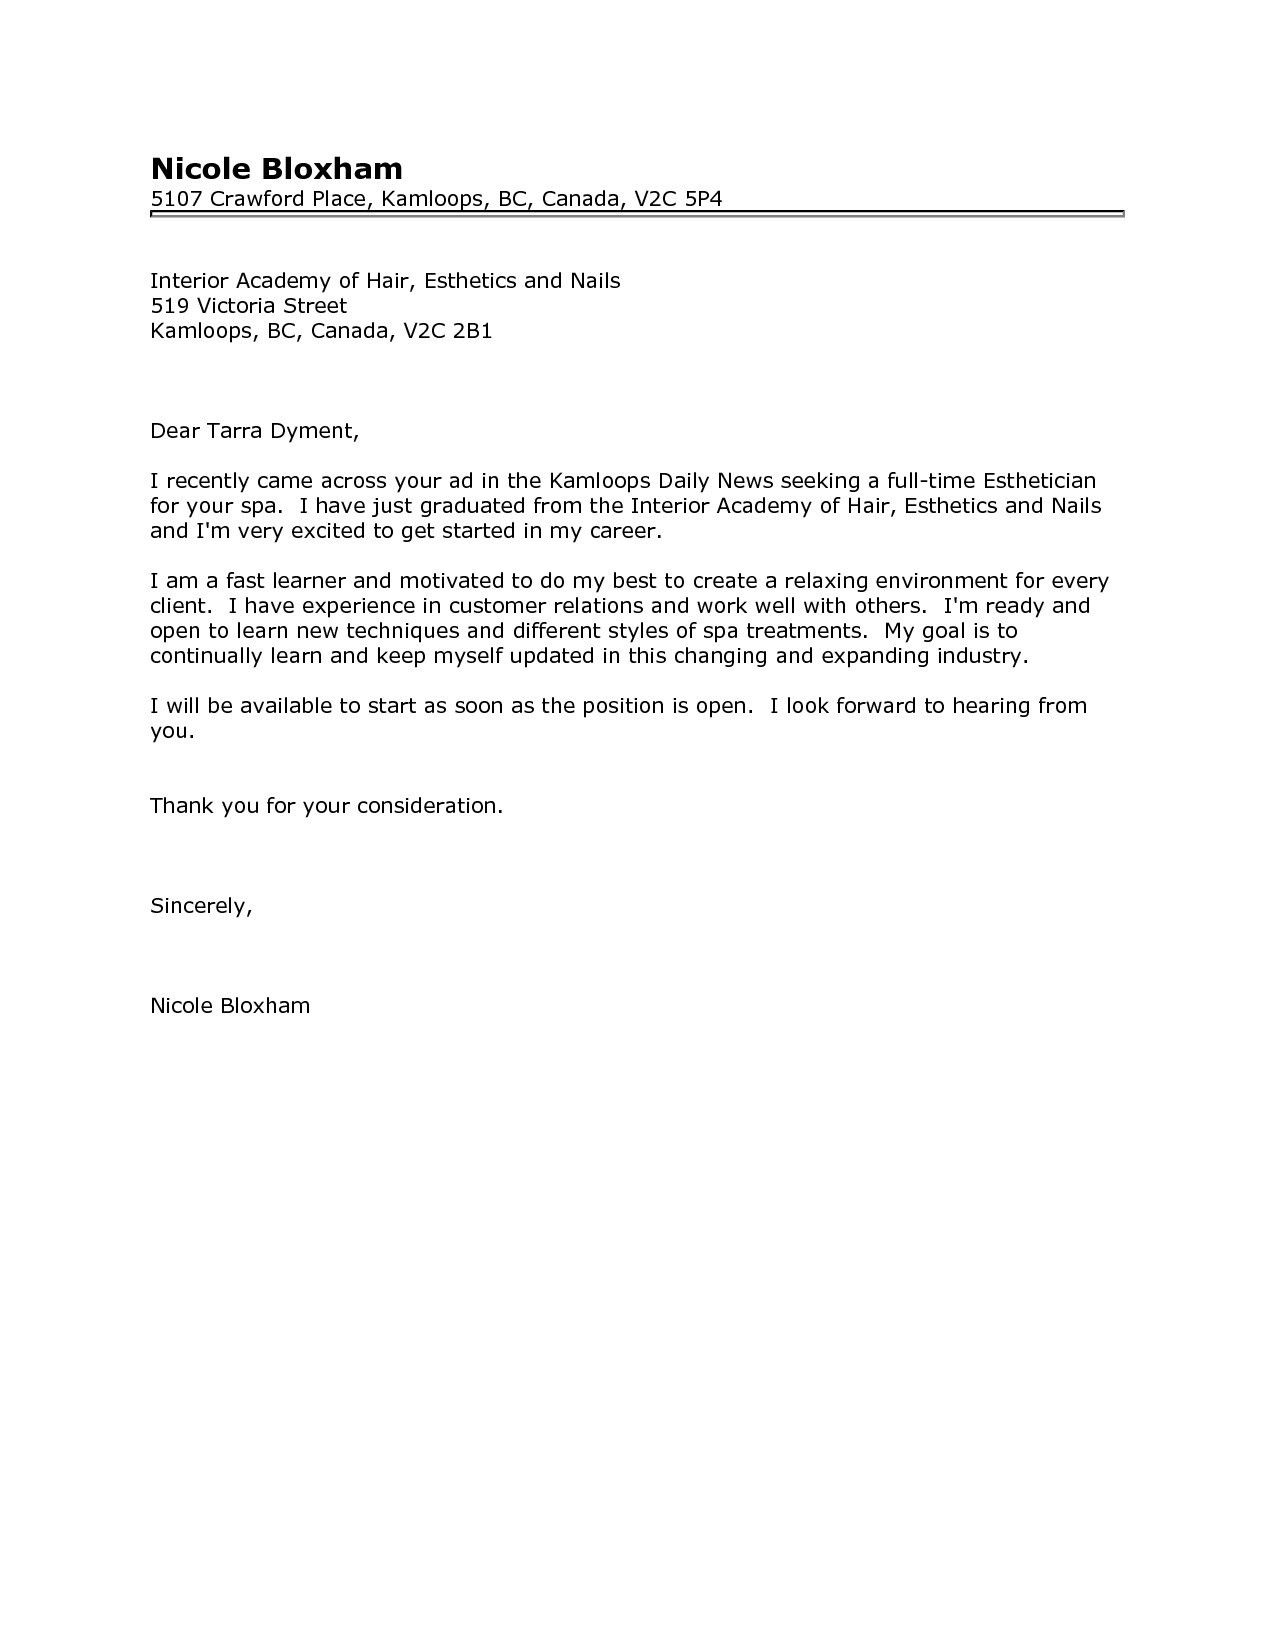 Pin by News PB on Resume Templates | Esthetician resume ...